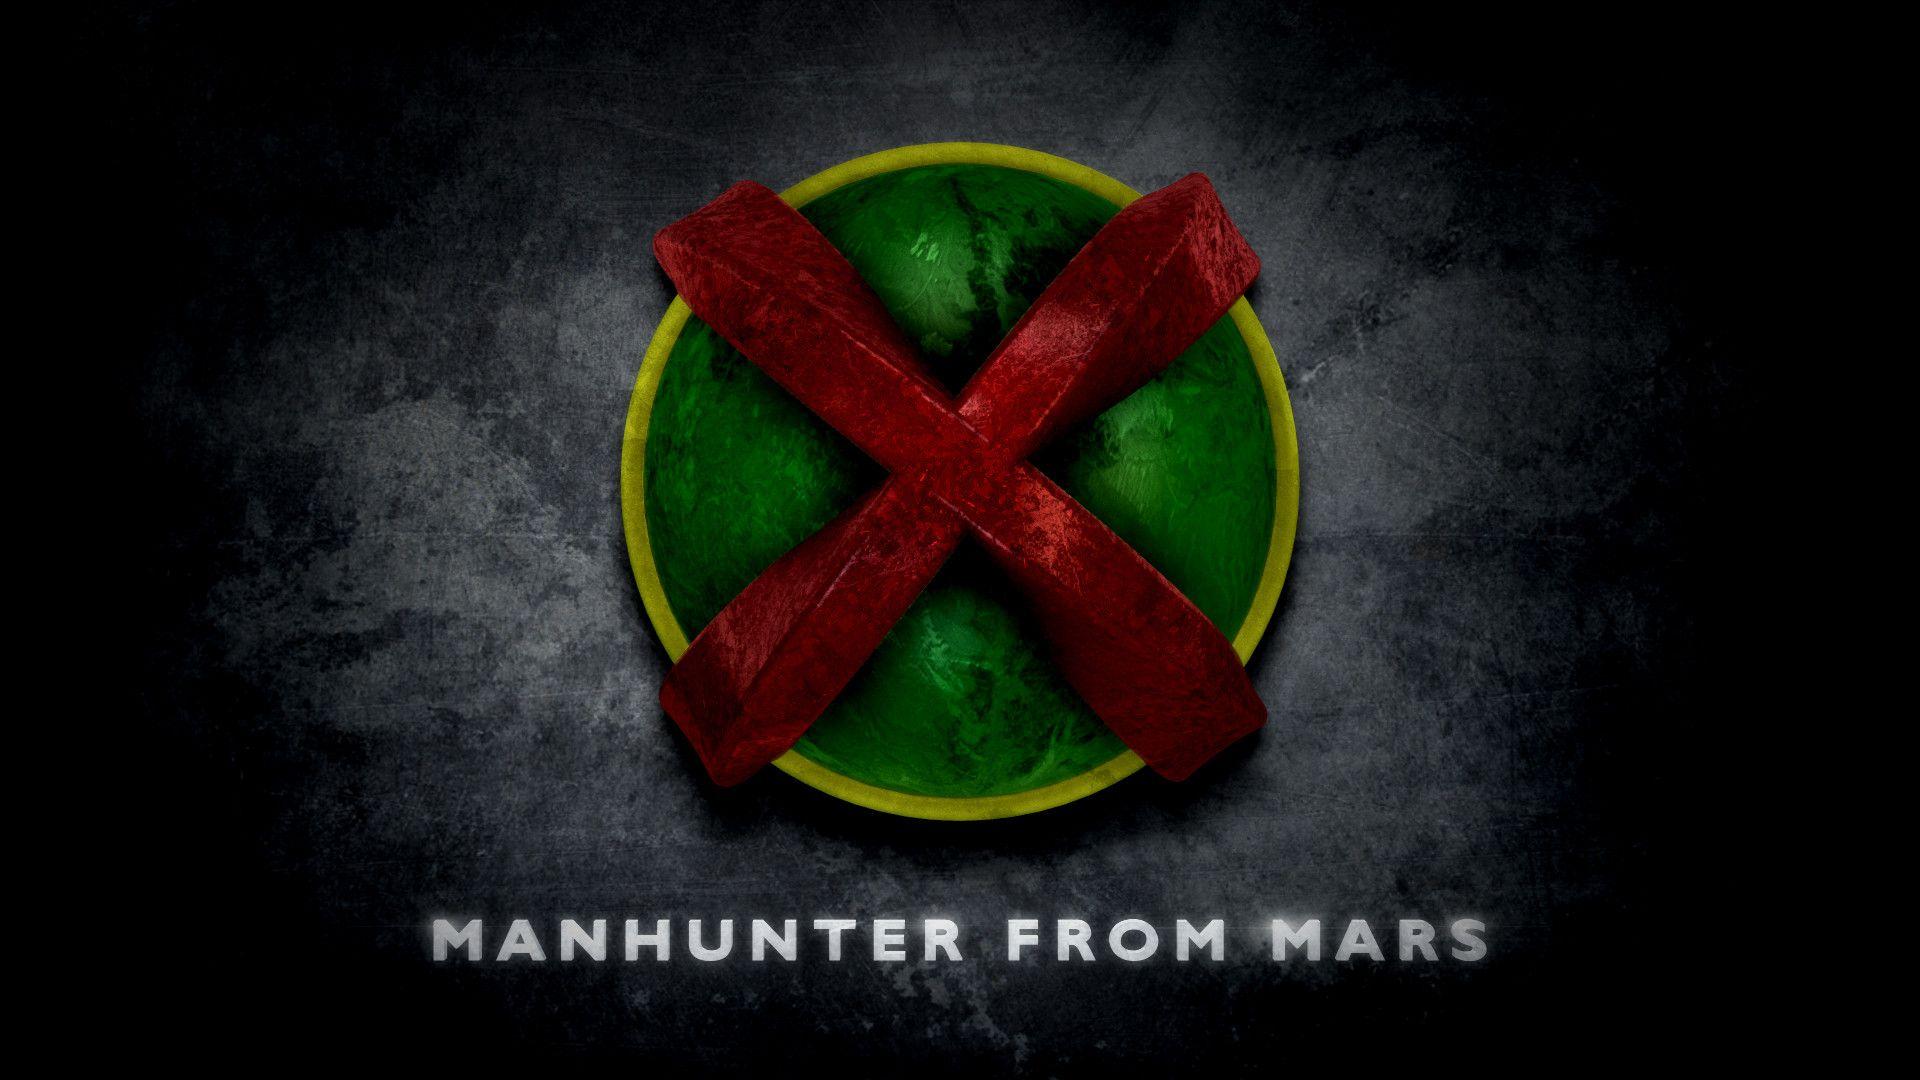 martian manhunter stylized logo dc universe logos